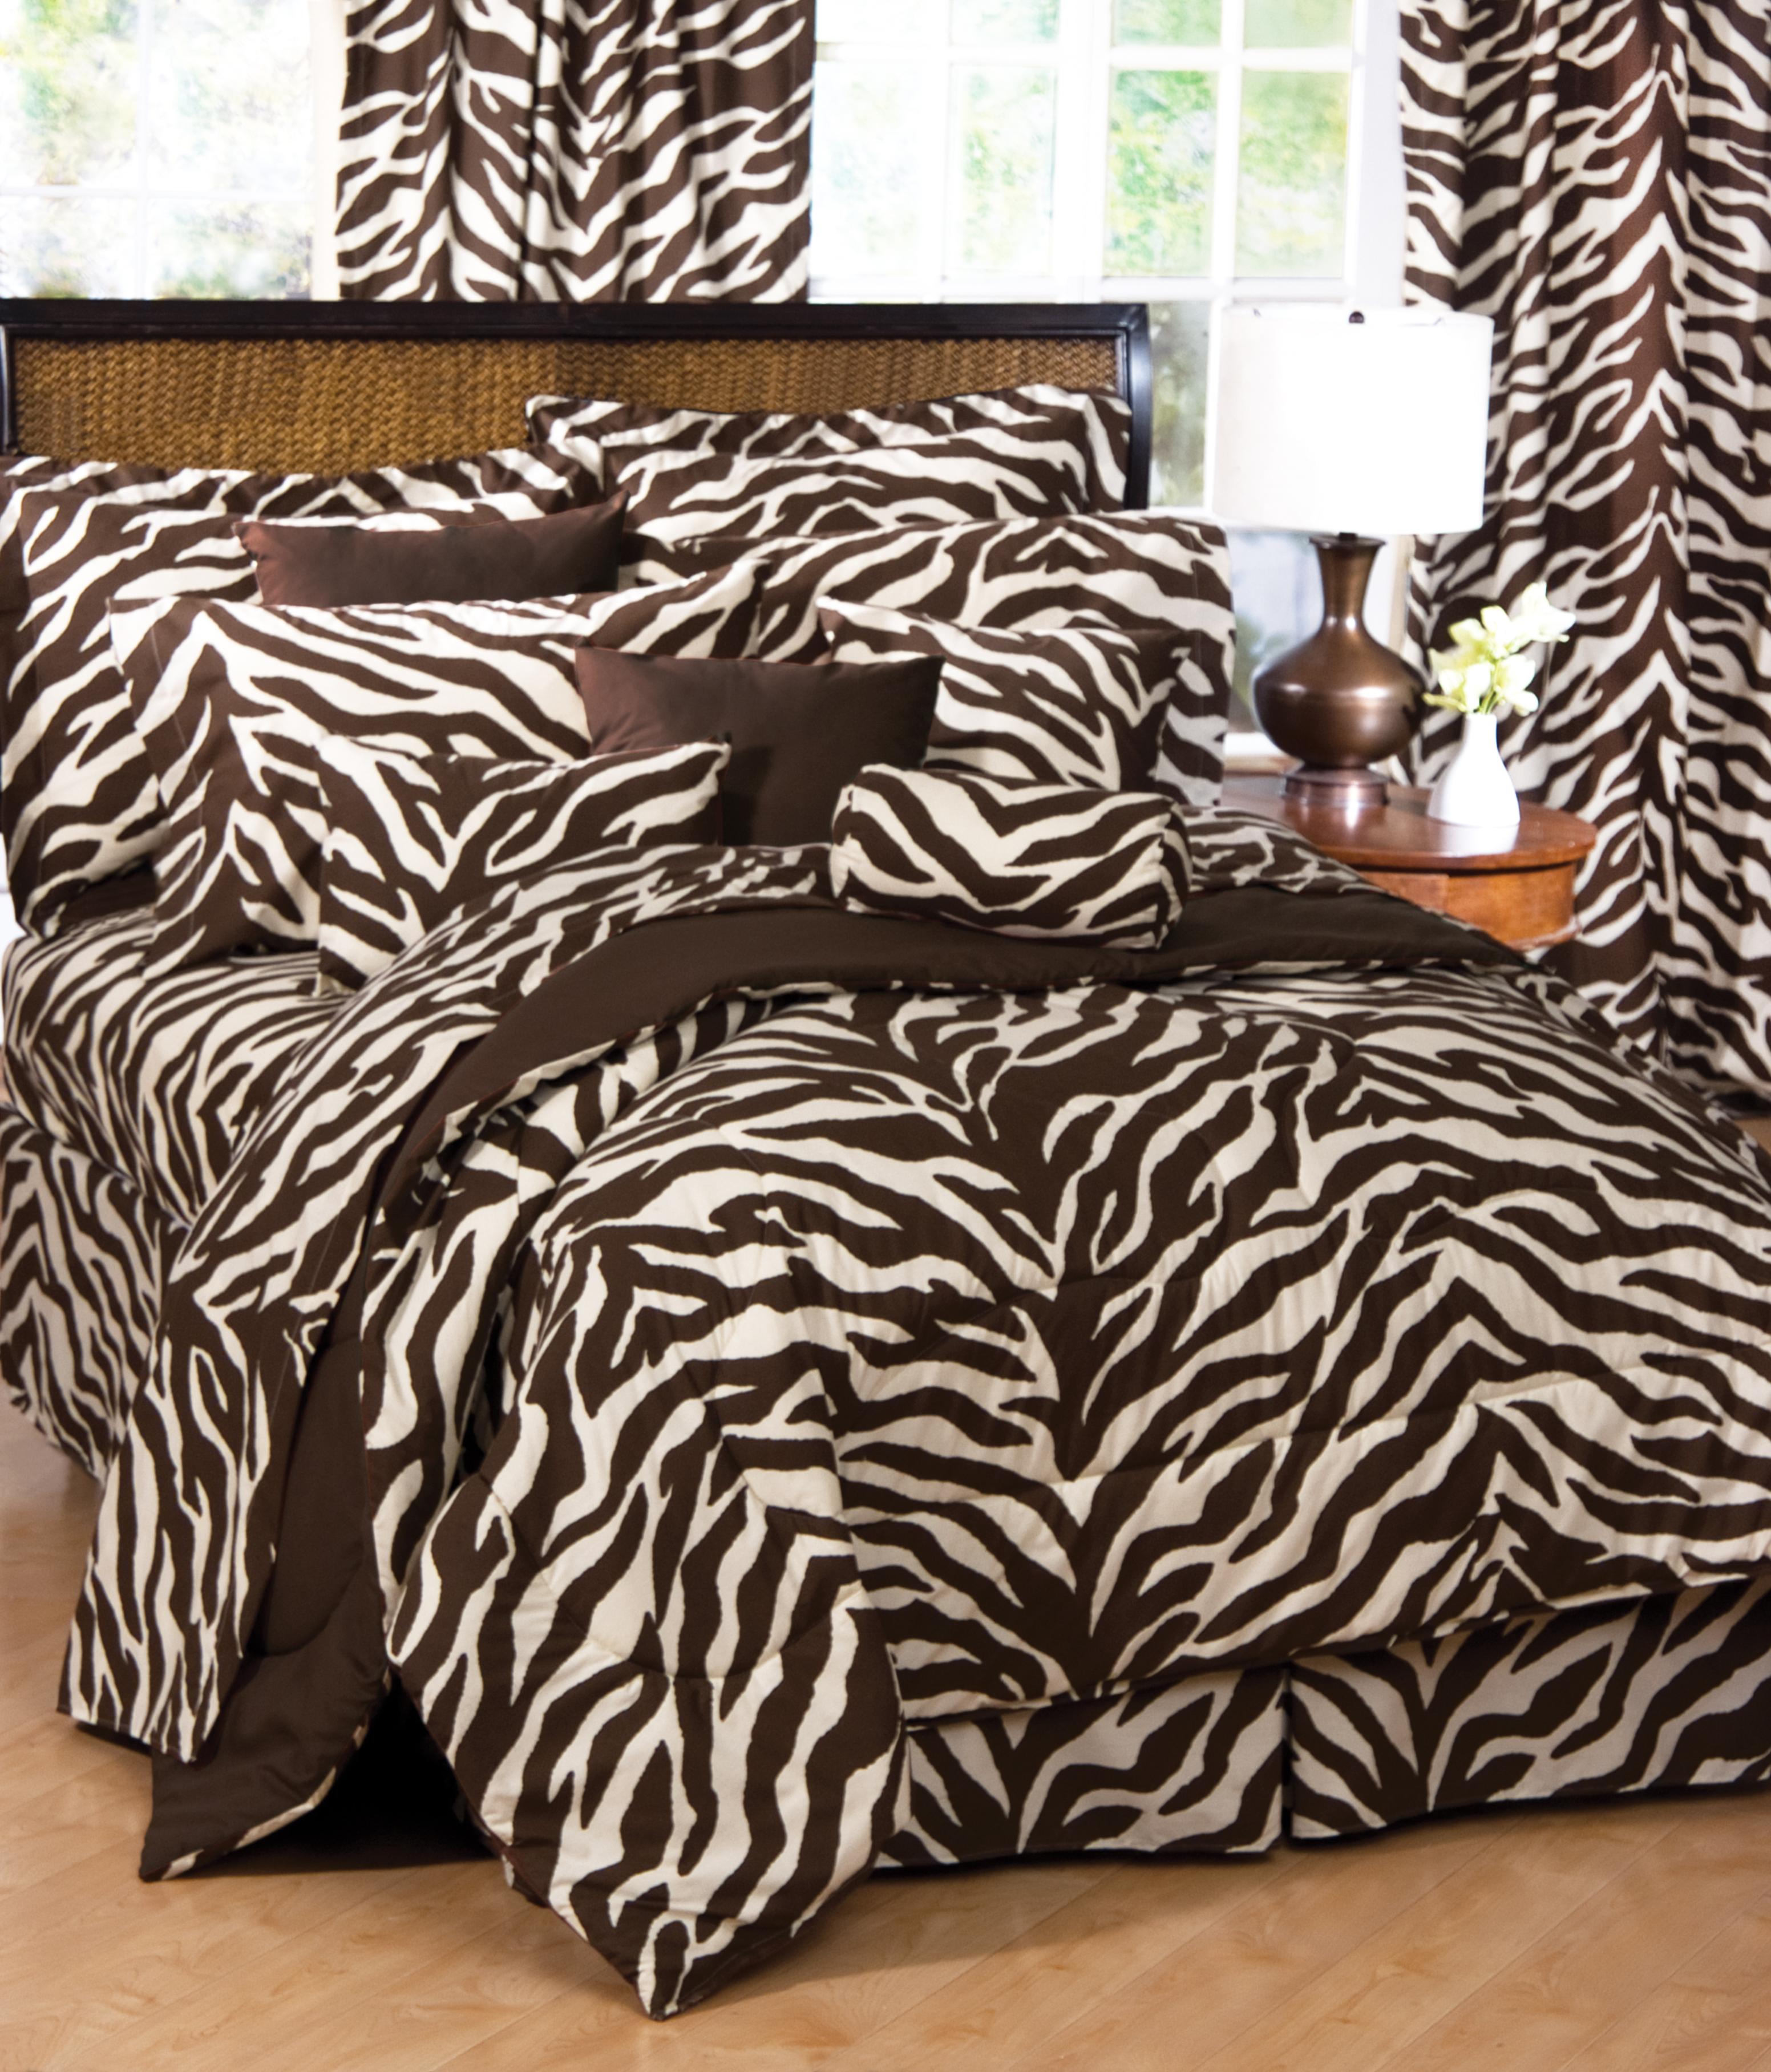 kimlor brown zebra print bed set search results